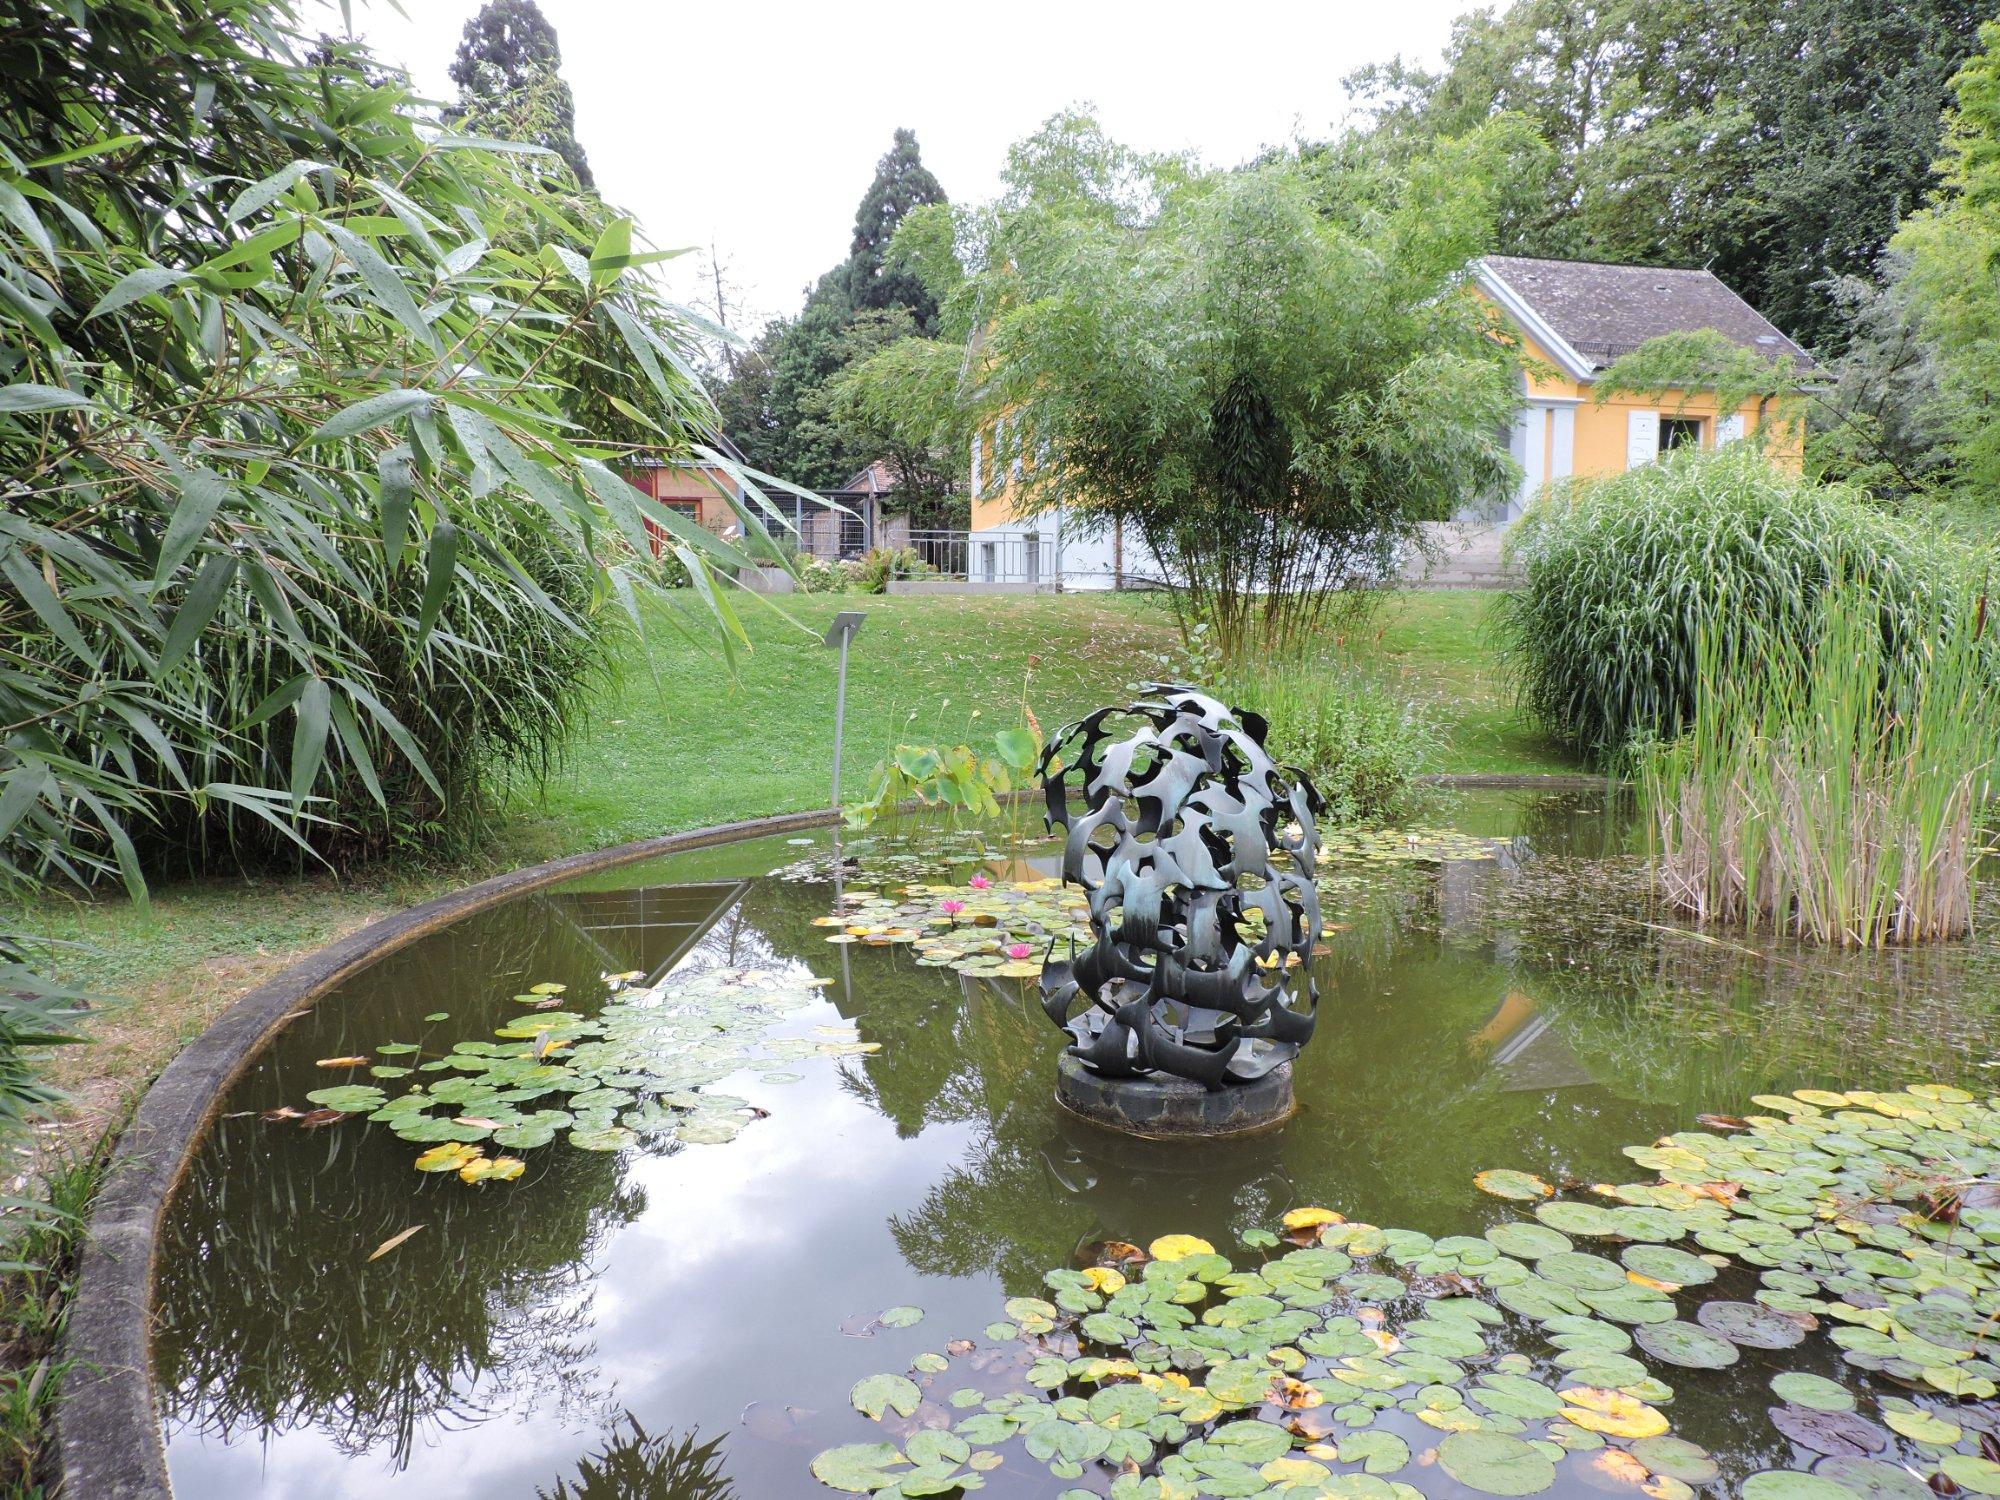 Jardin botanico de friburgo freiburg im breisgau for Botanico jardin